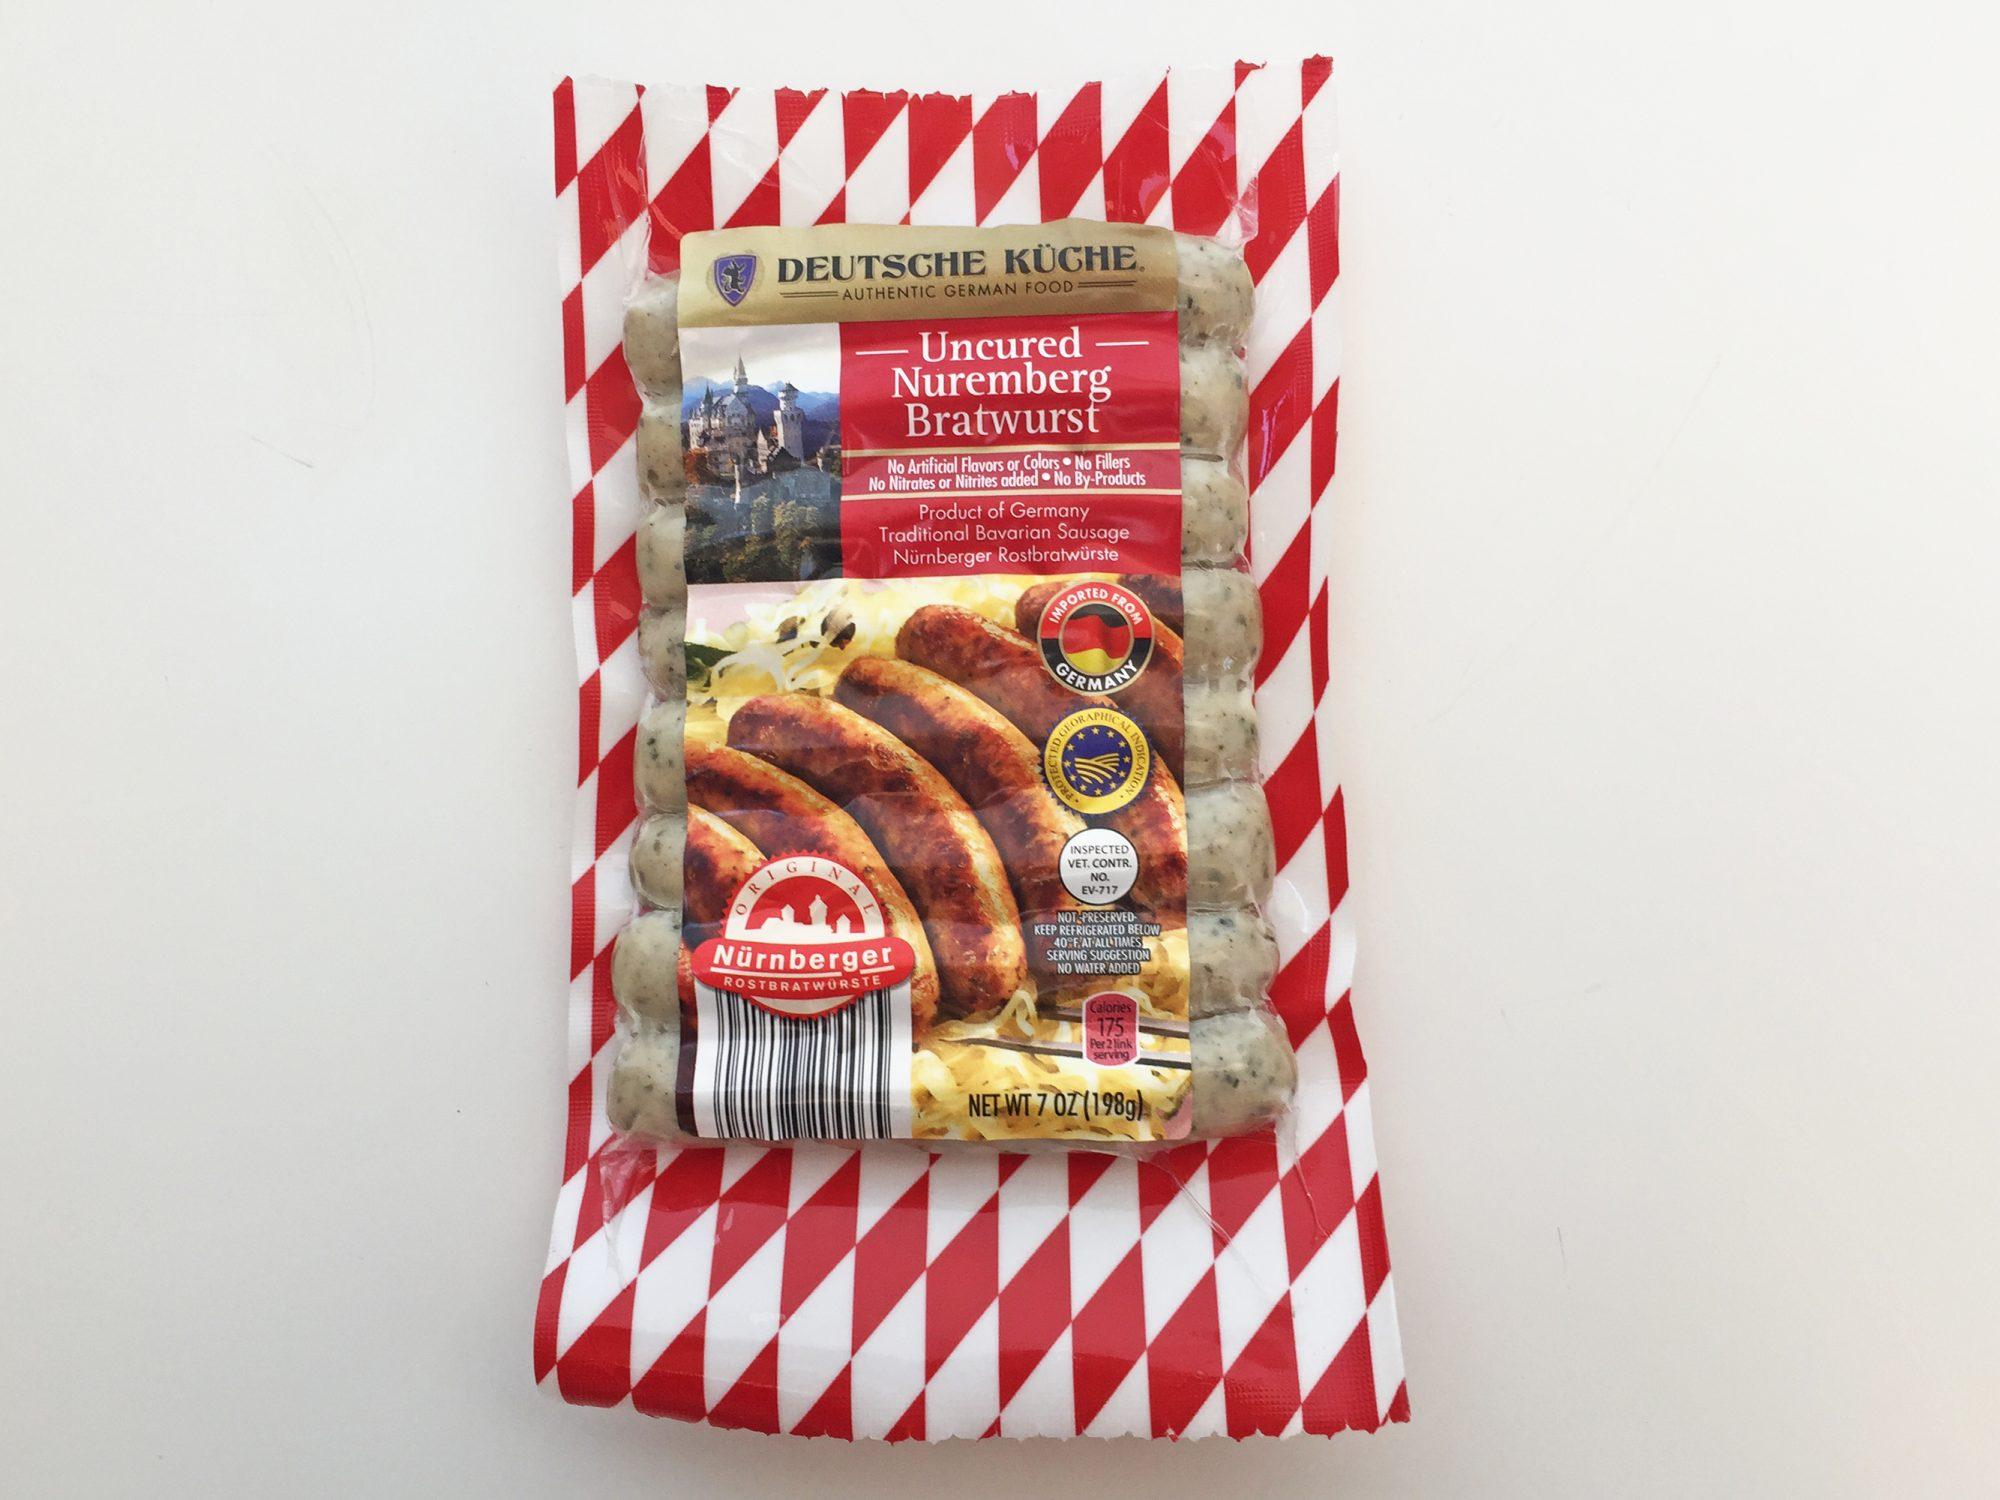 uncured-nuremberg-bratwurst-image